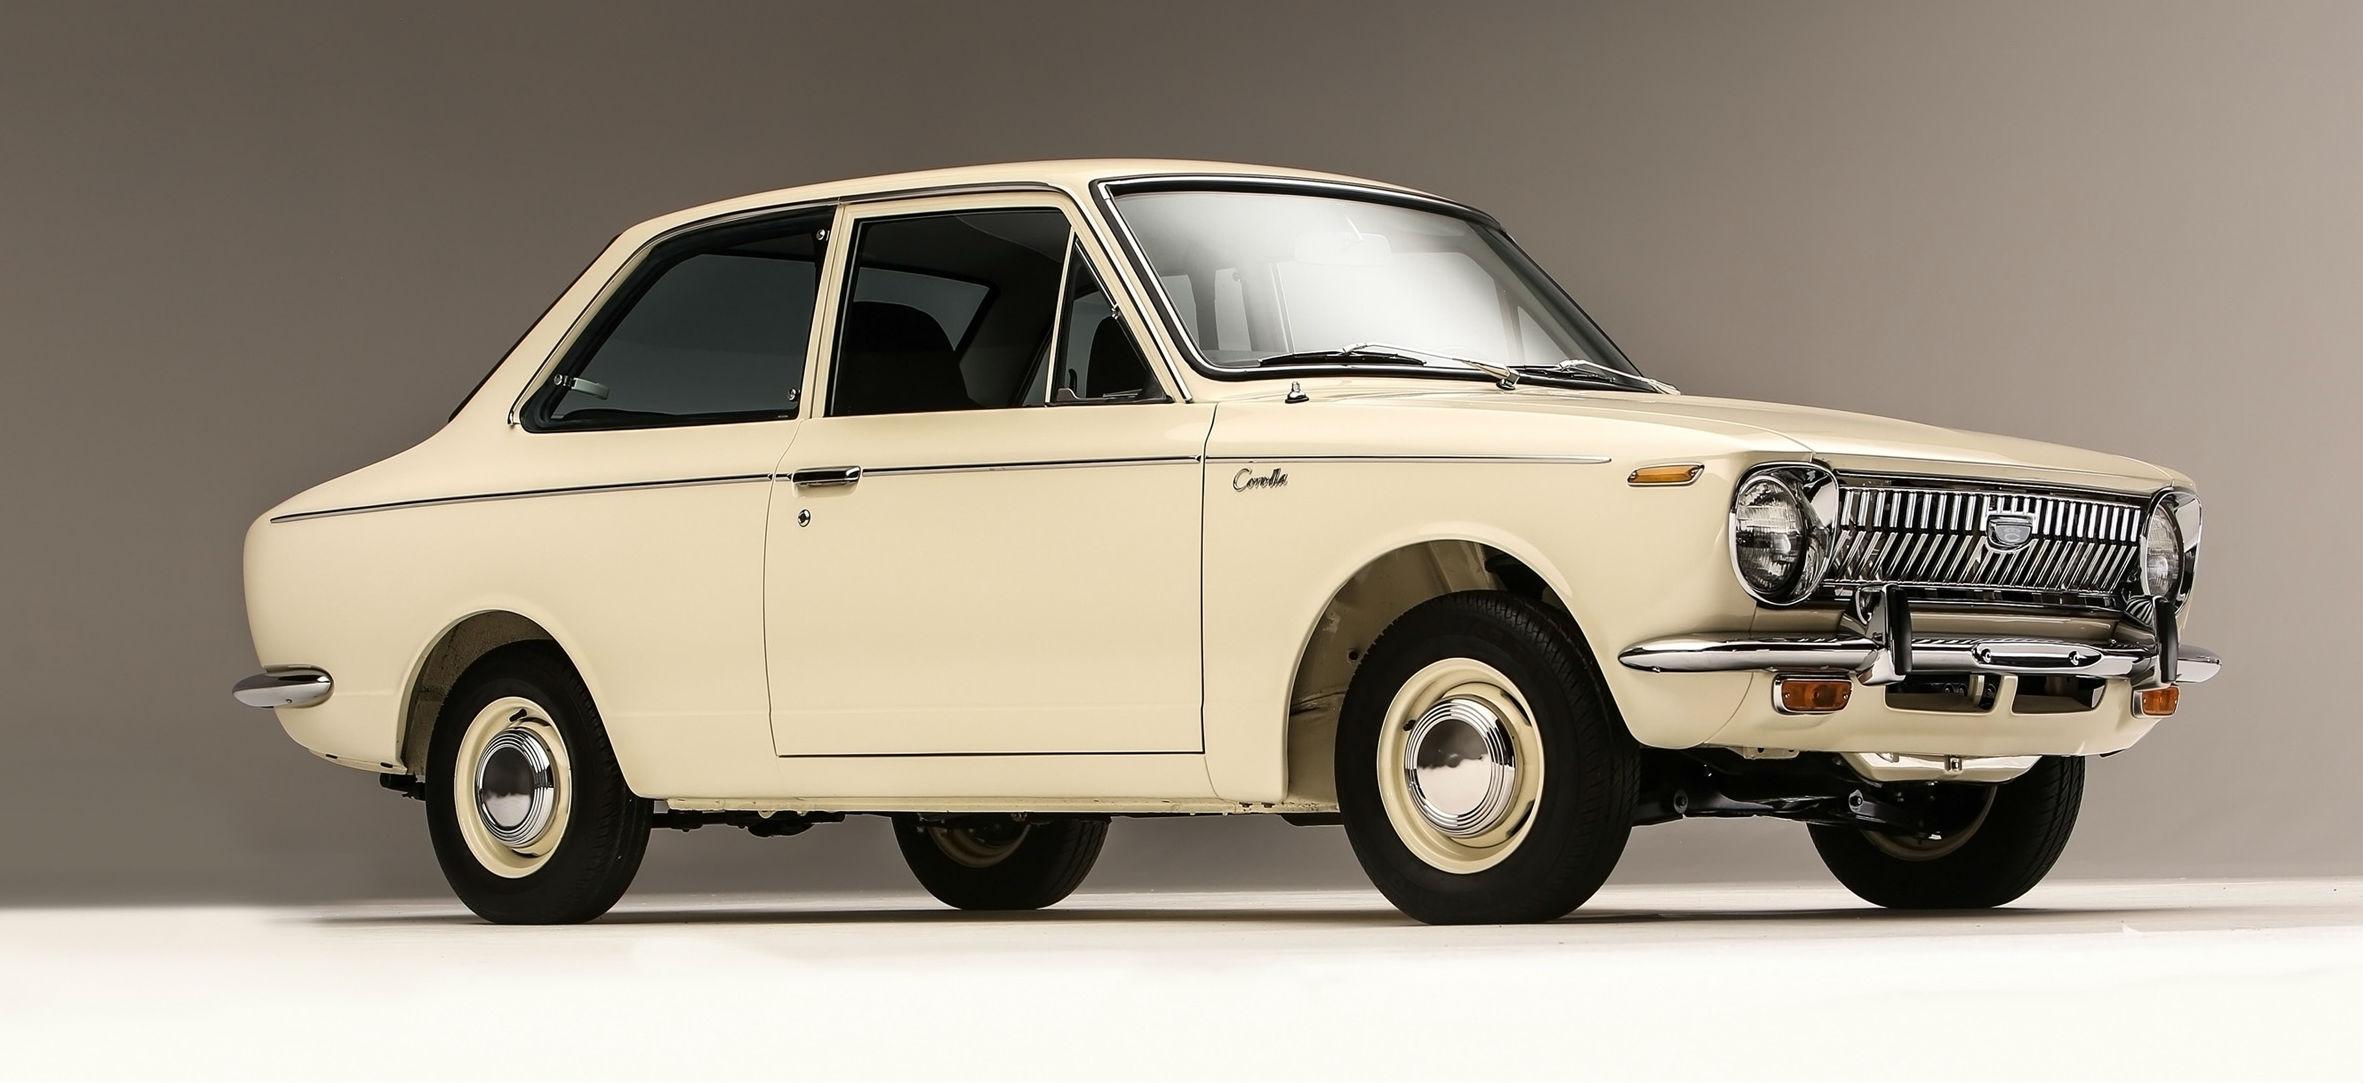 Toyota Corolla 1969